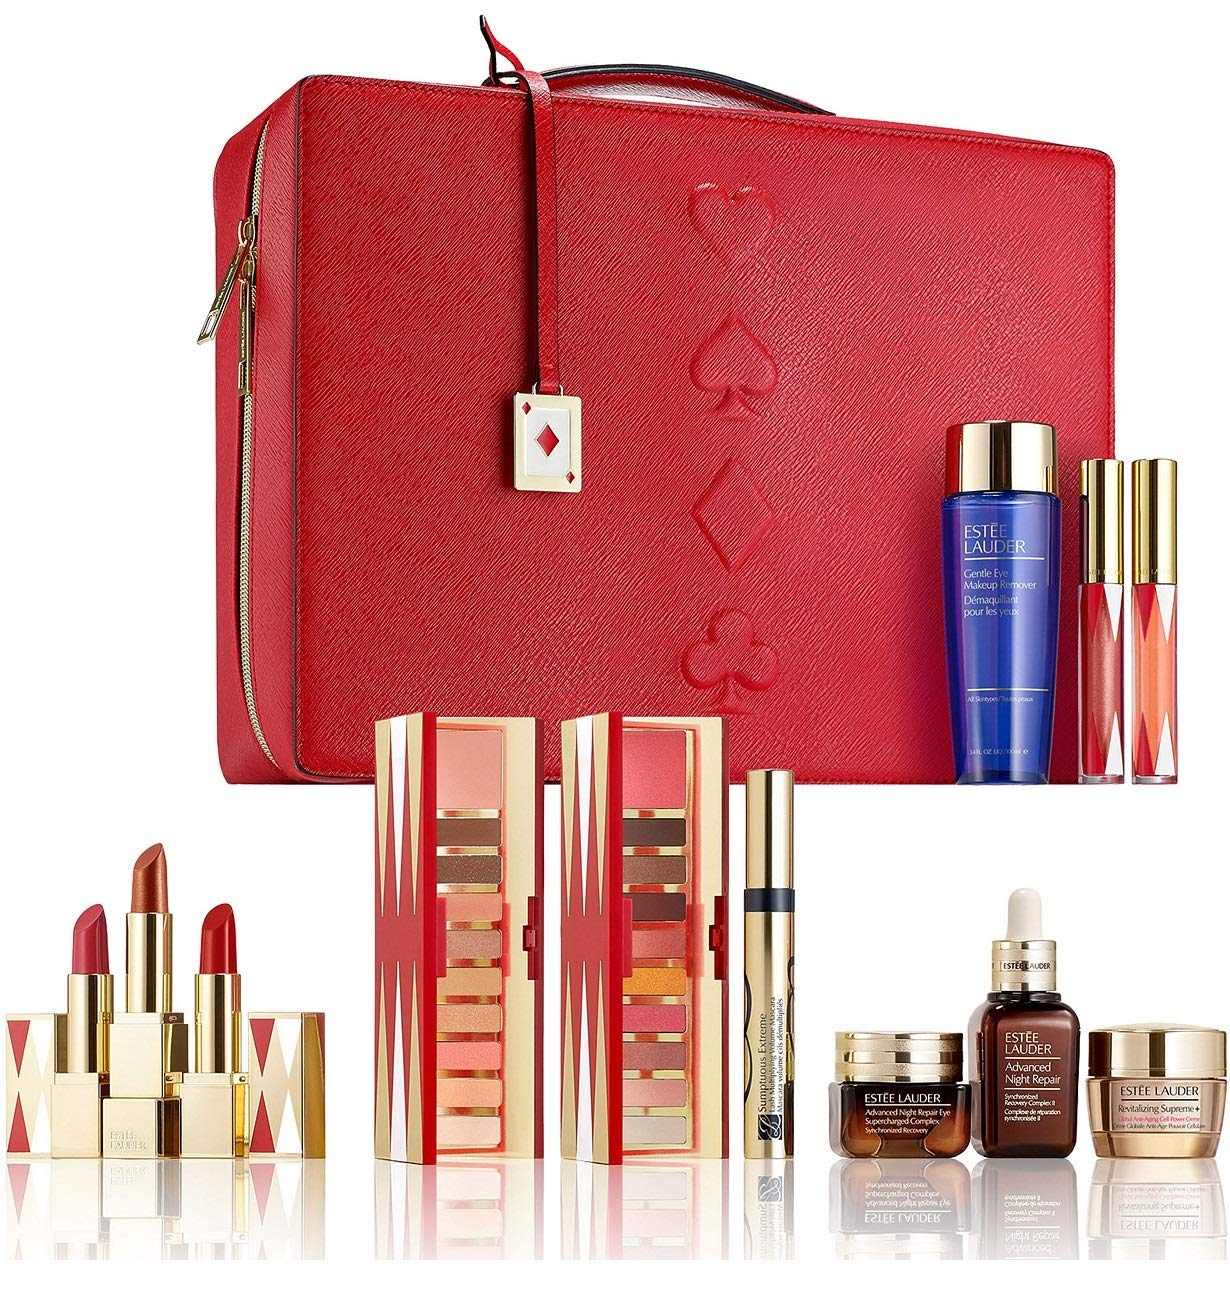 Estee Lauder Christmas Gift Set 2020 Amazon.: Estee Lauder 2019 Holiday Blockbuster Gift Set $455+